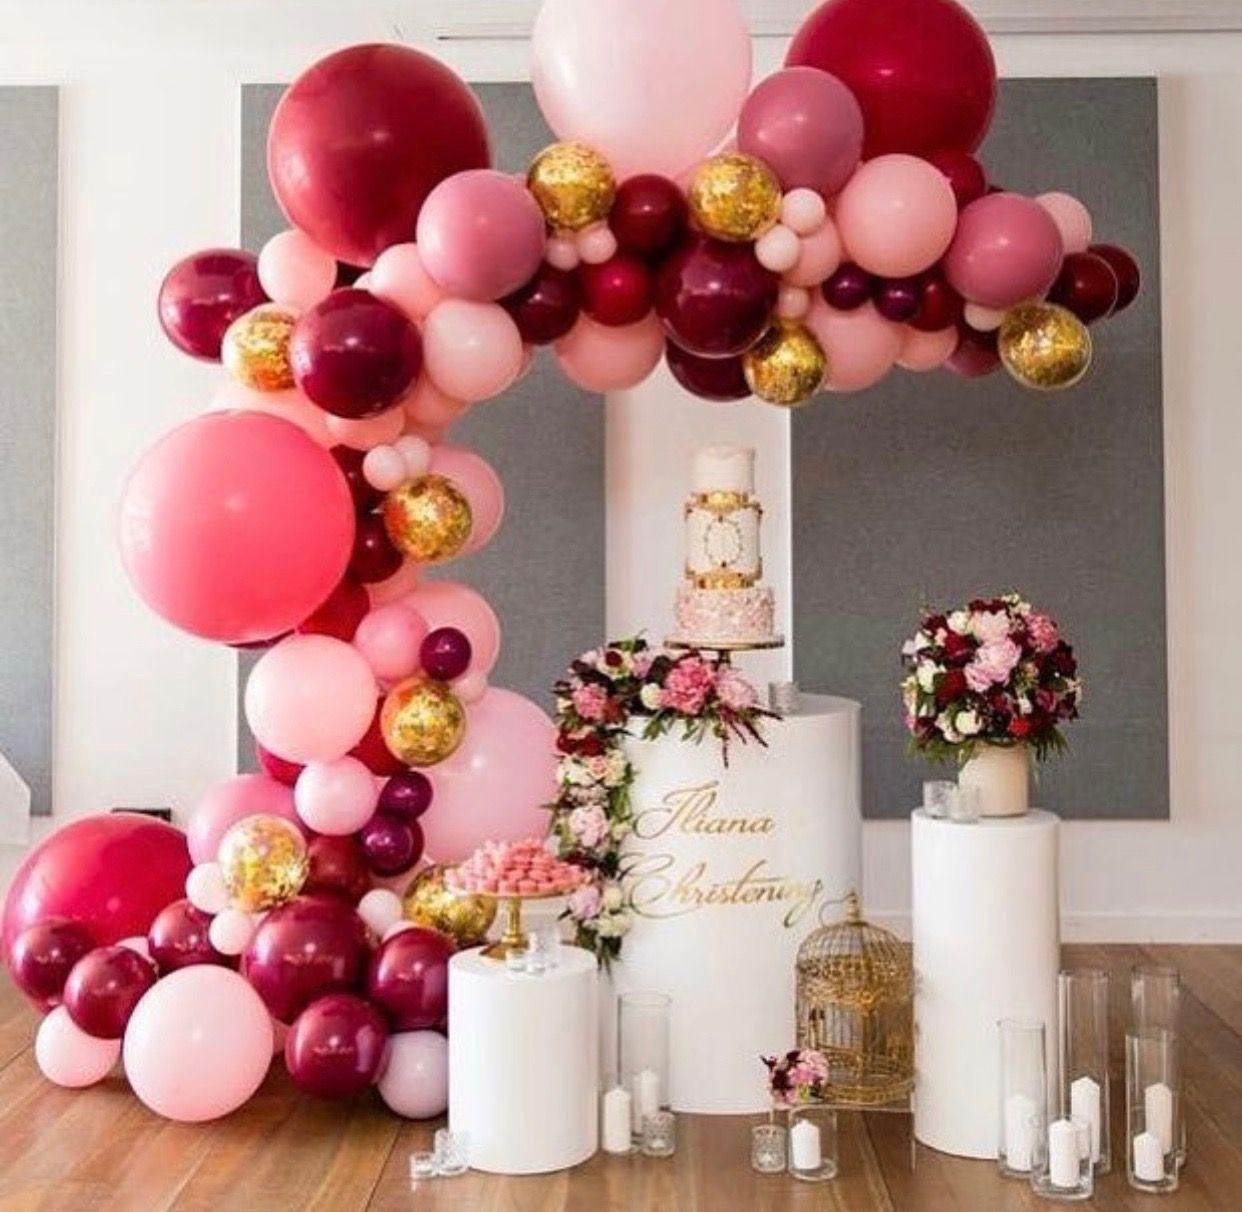 Pin De Nanny Perdomo Em Baby Festa De Aniversario Decoracao Festa Com Decoracao De Baloes Decoracao Aniversario